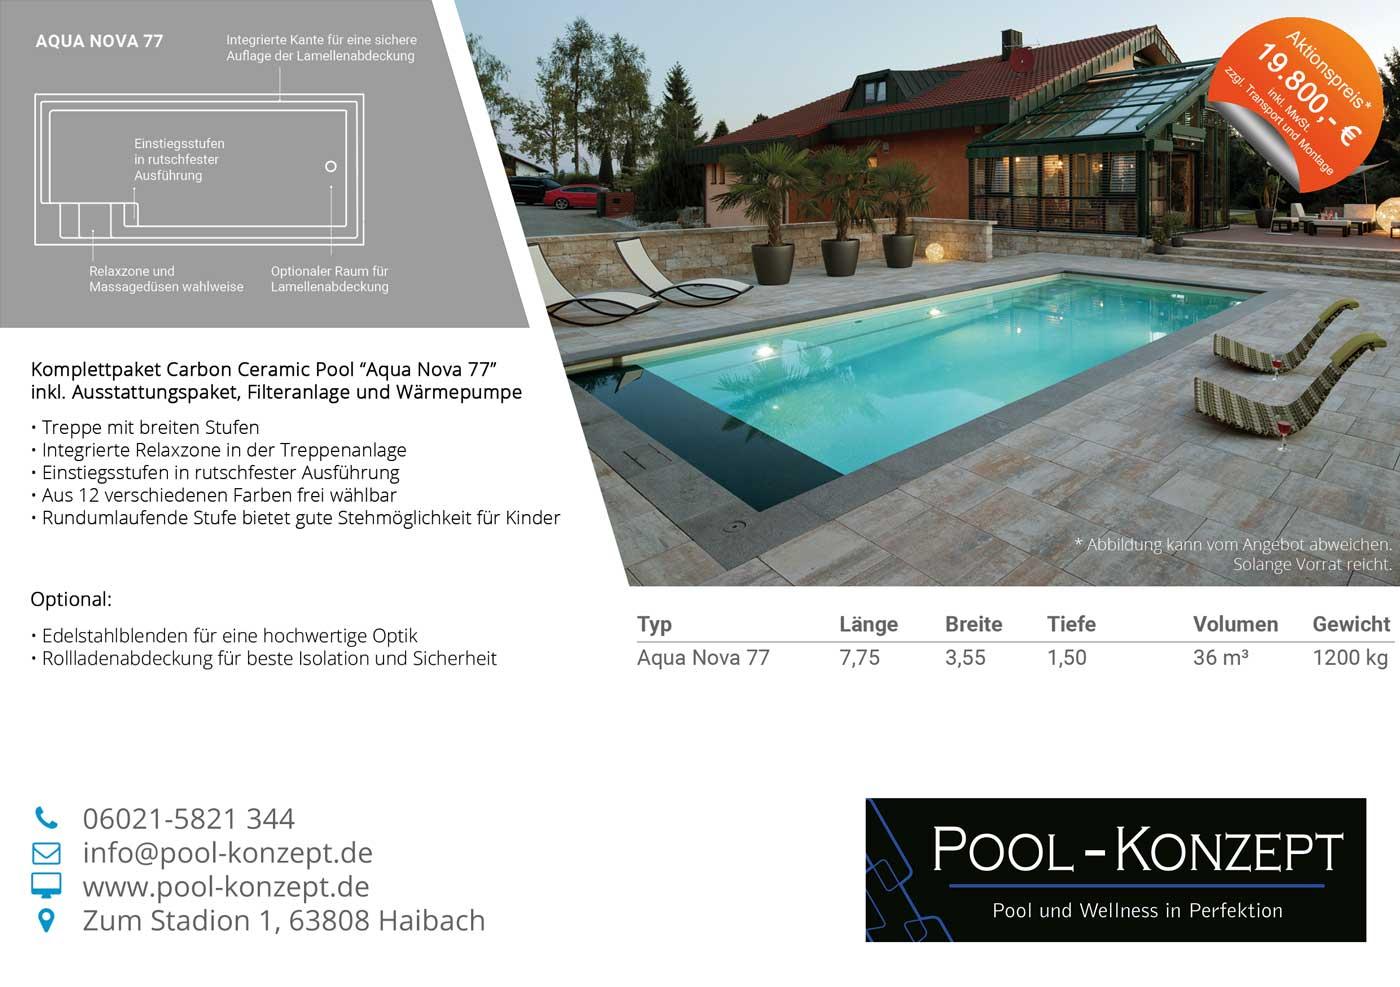 Pool Konzept nova77 aktion big pool konzept